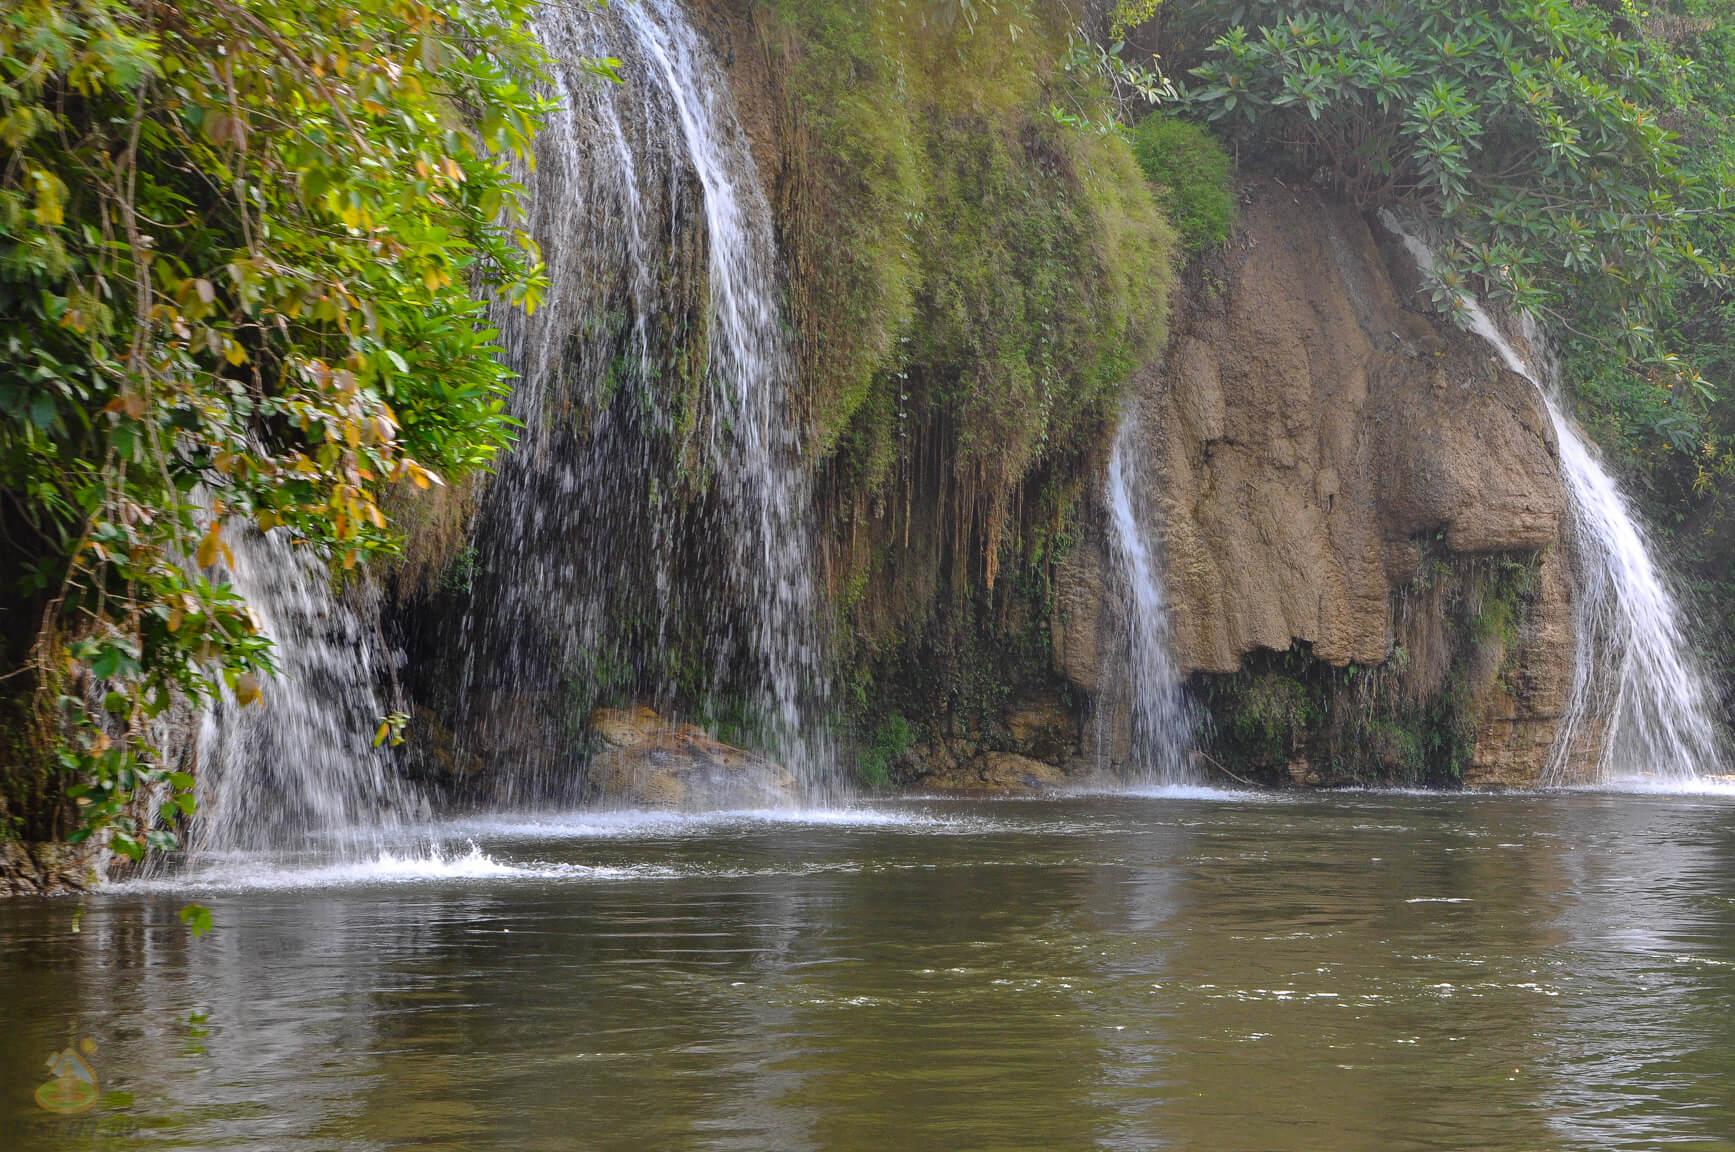 Река Квай в Тайланде, водопады